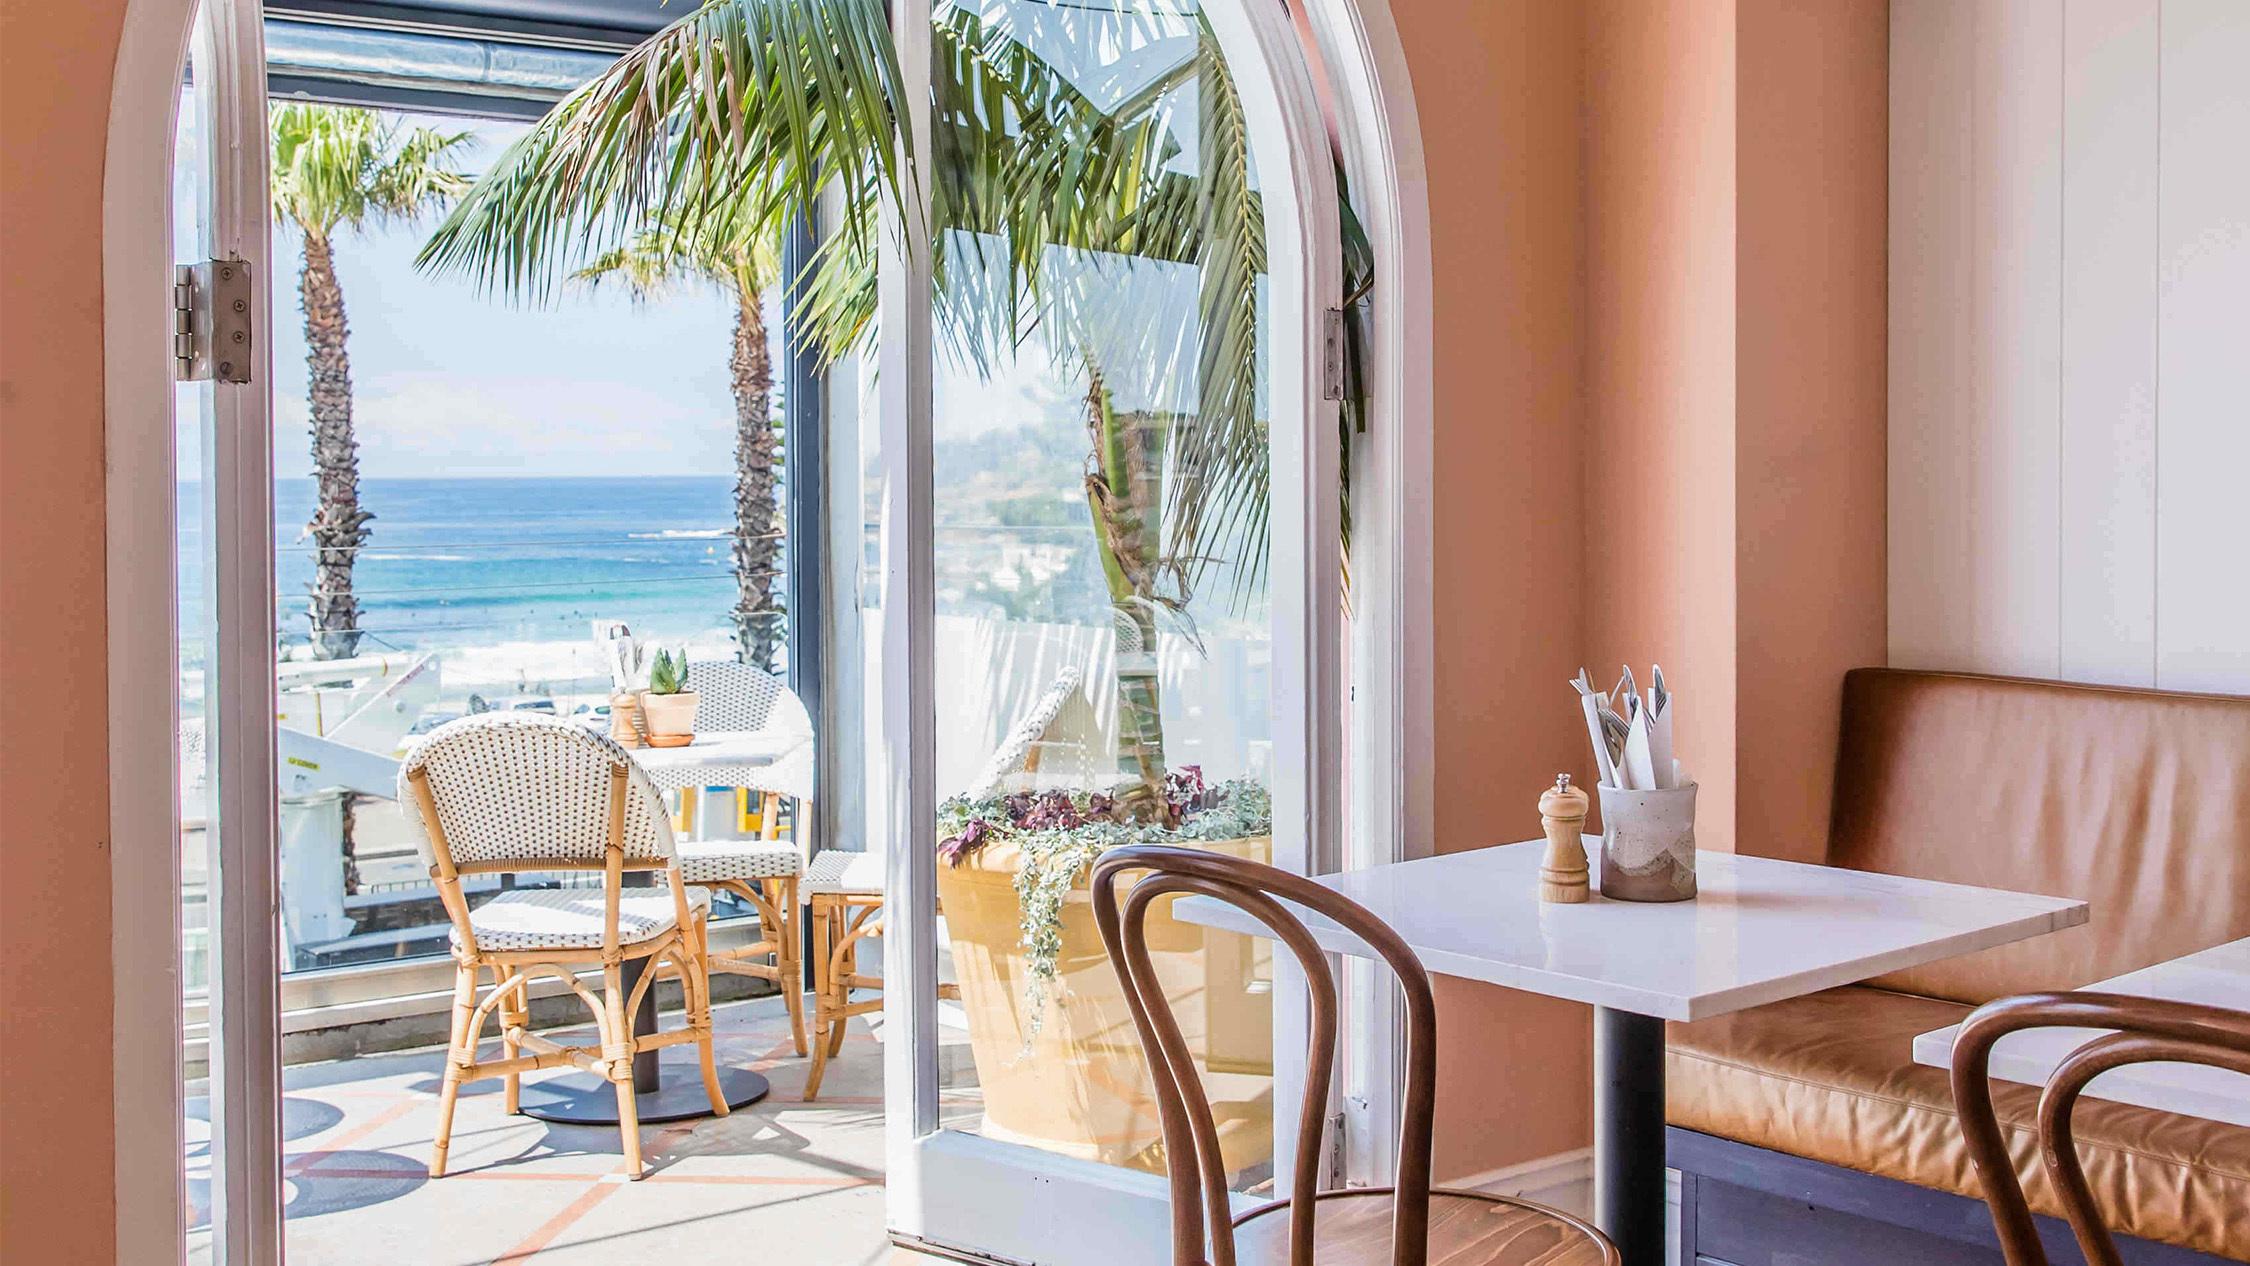 Hotel Ravesis window view